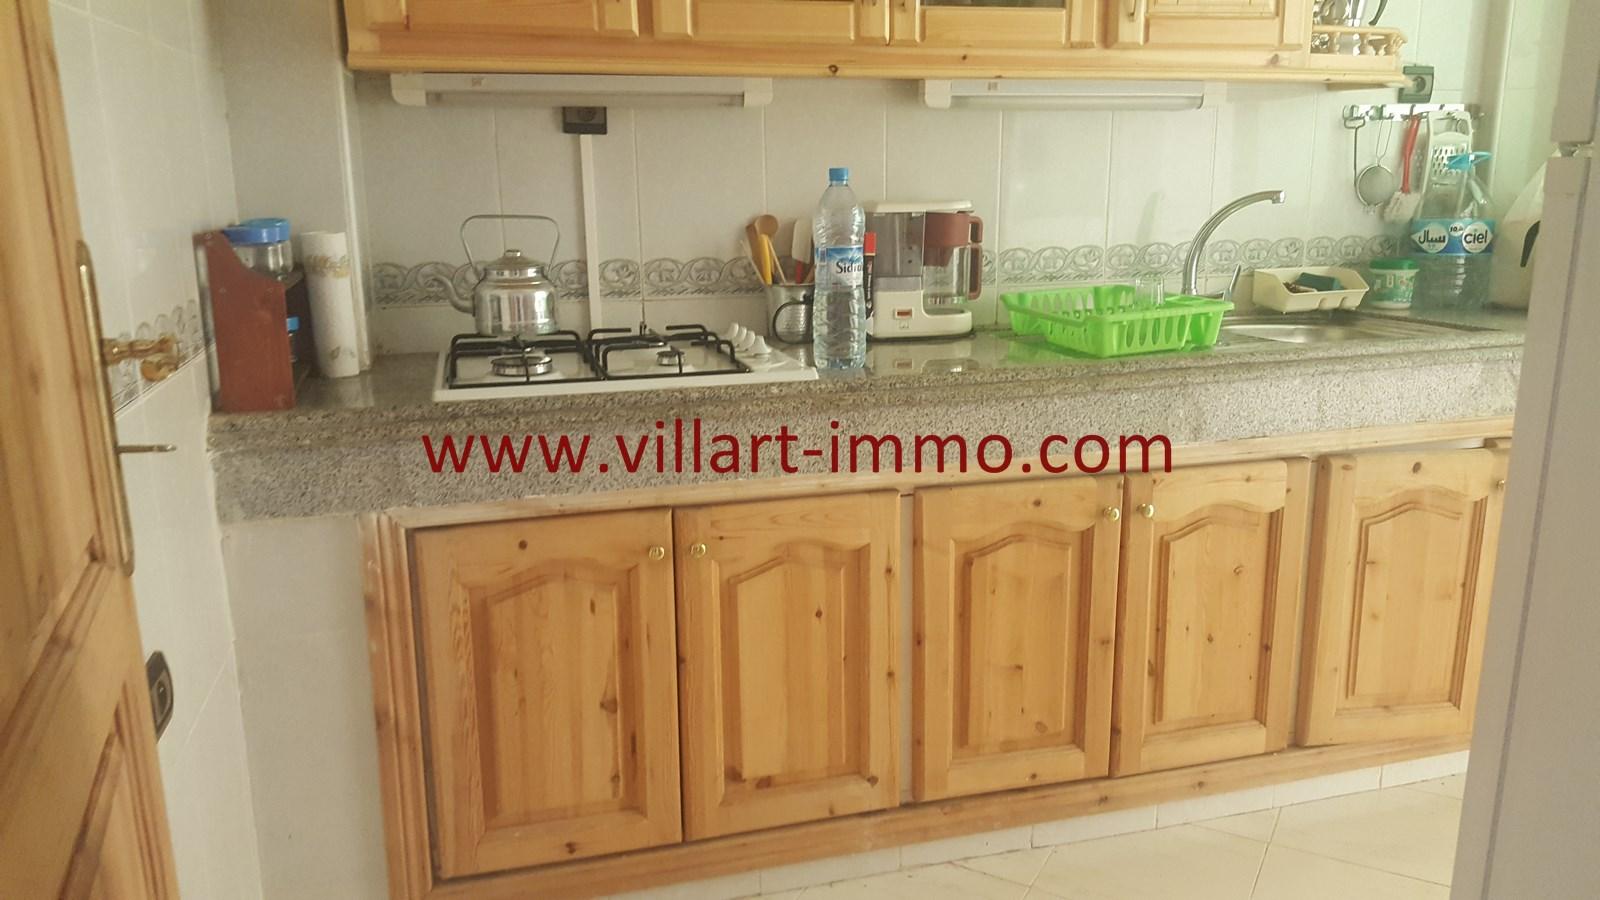 3-Vente-Appartement-Assilah-Cuisine-VA508-Villart Immo